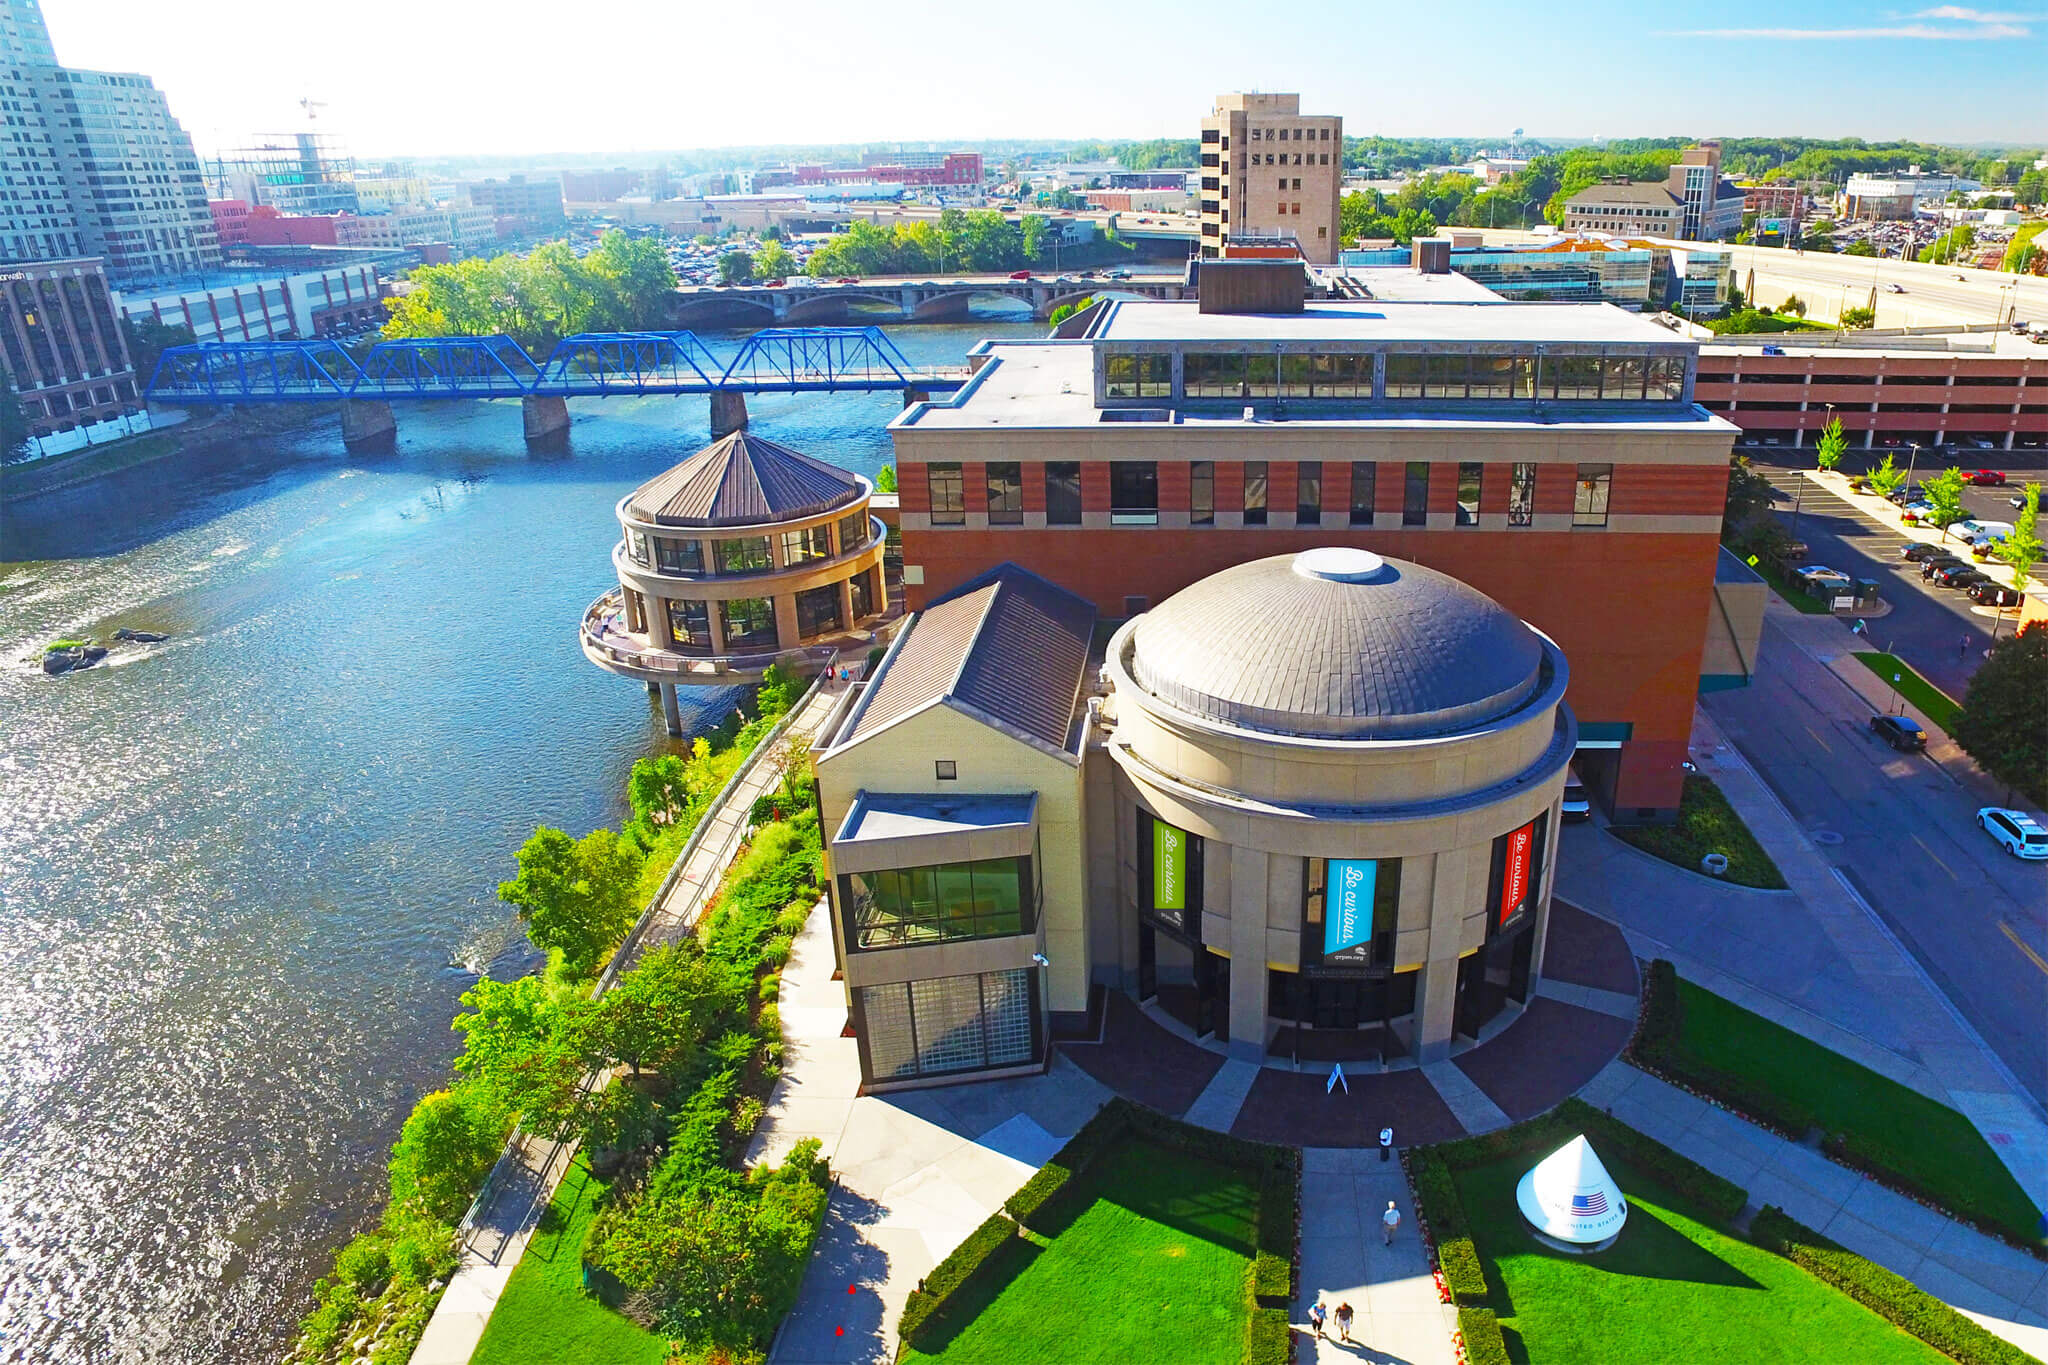 Grand Rapids Public Museum Be curious